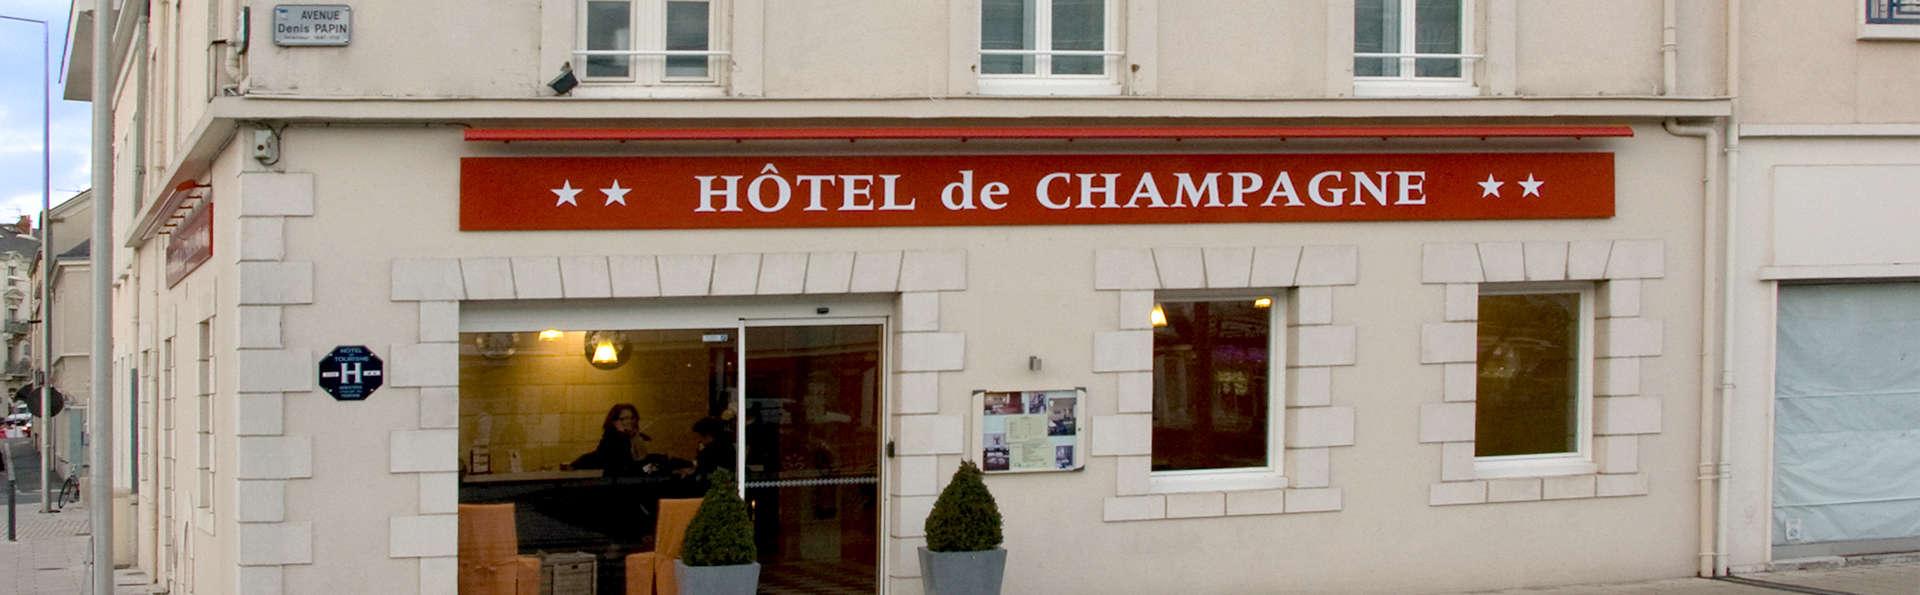 Hôtel de Champagne - Edit_Front.jpg